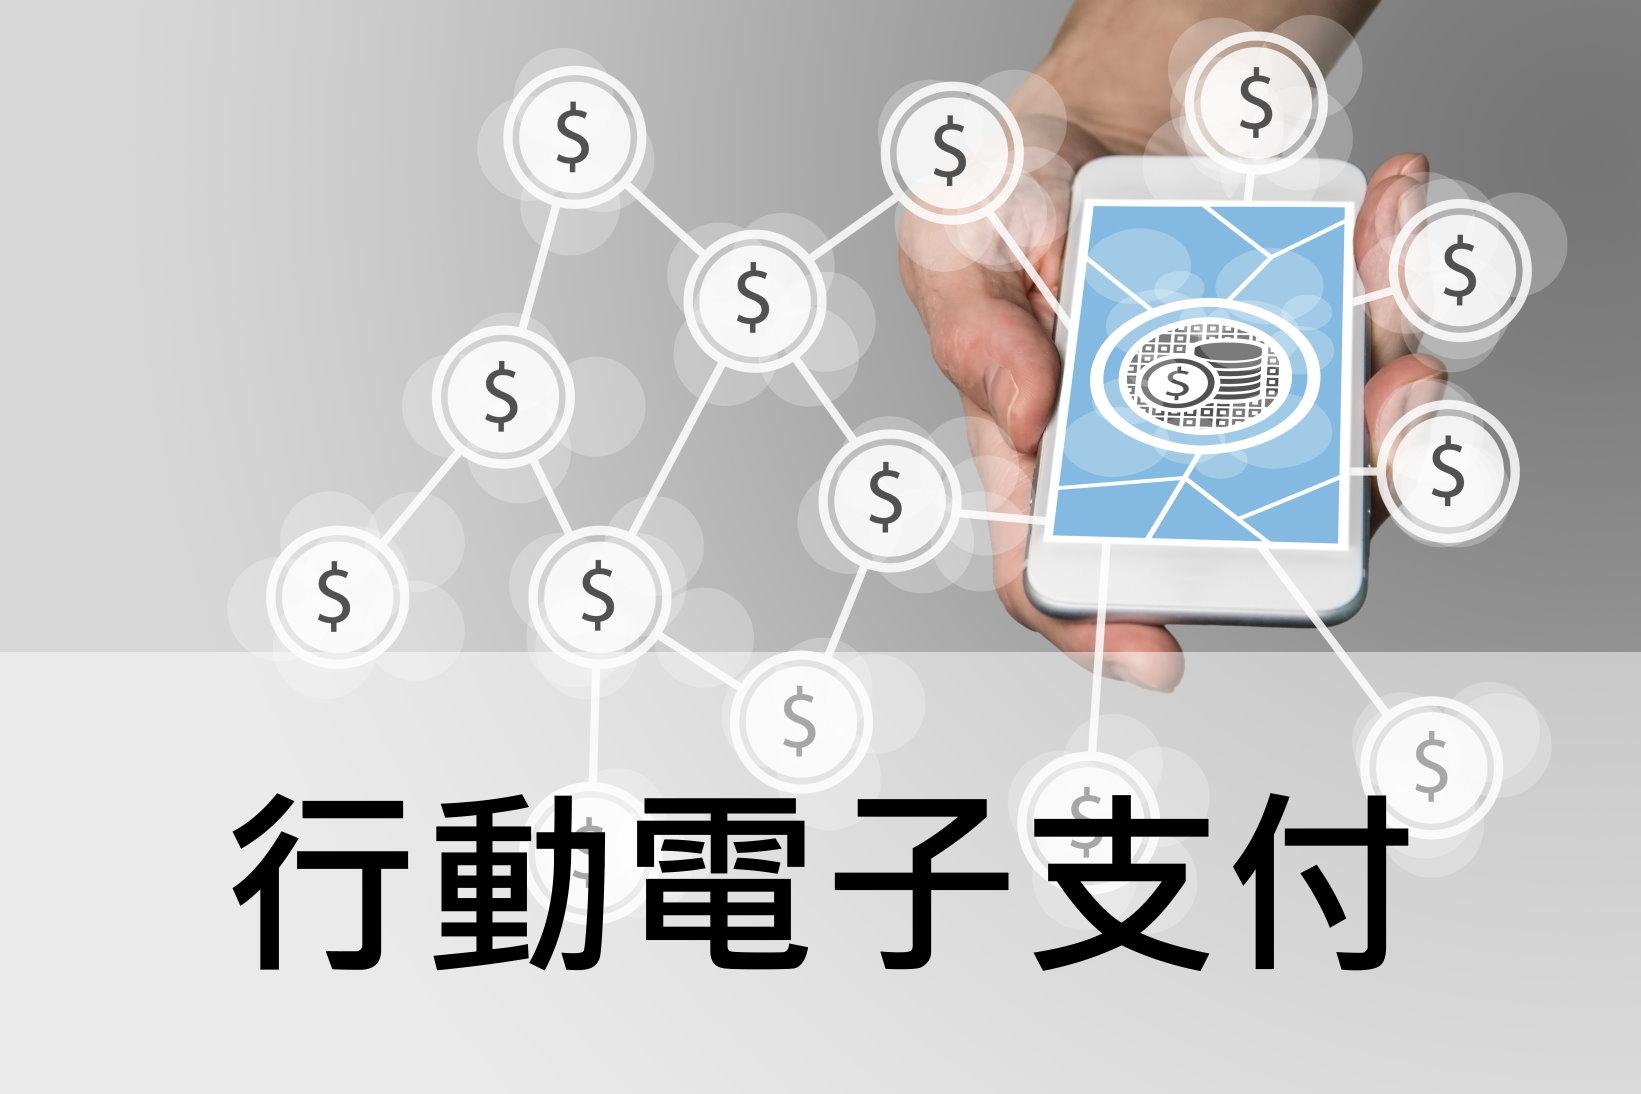 Digital Finance 08 26 02